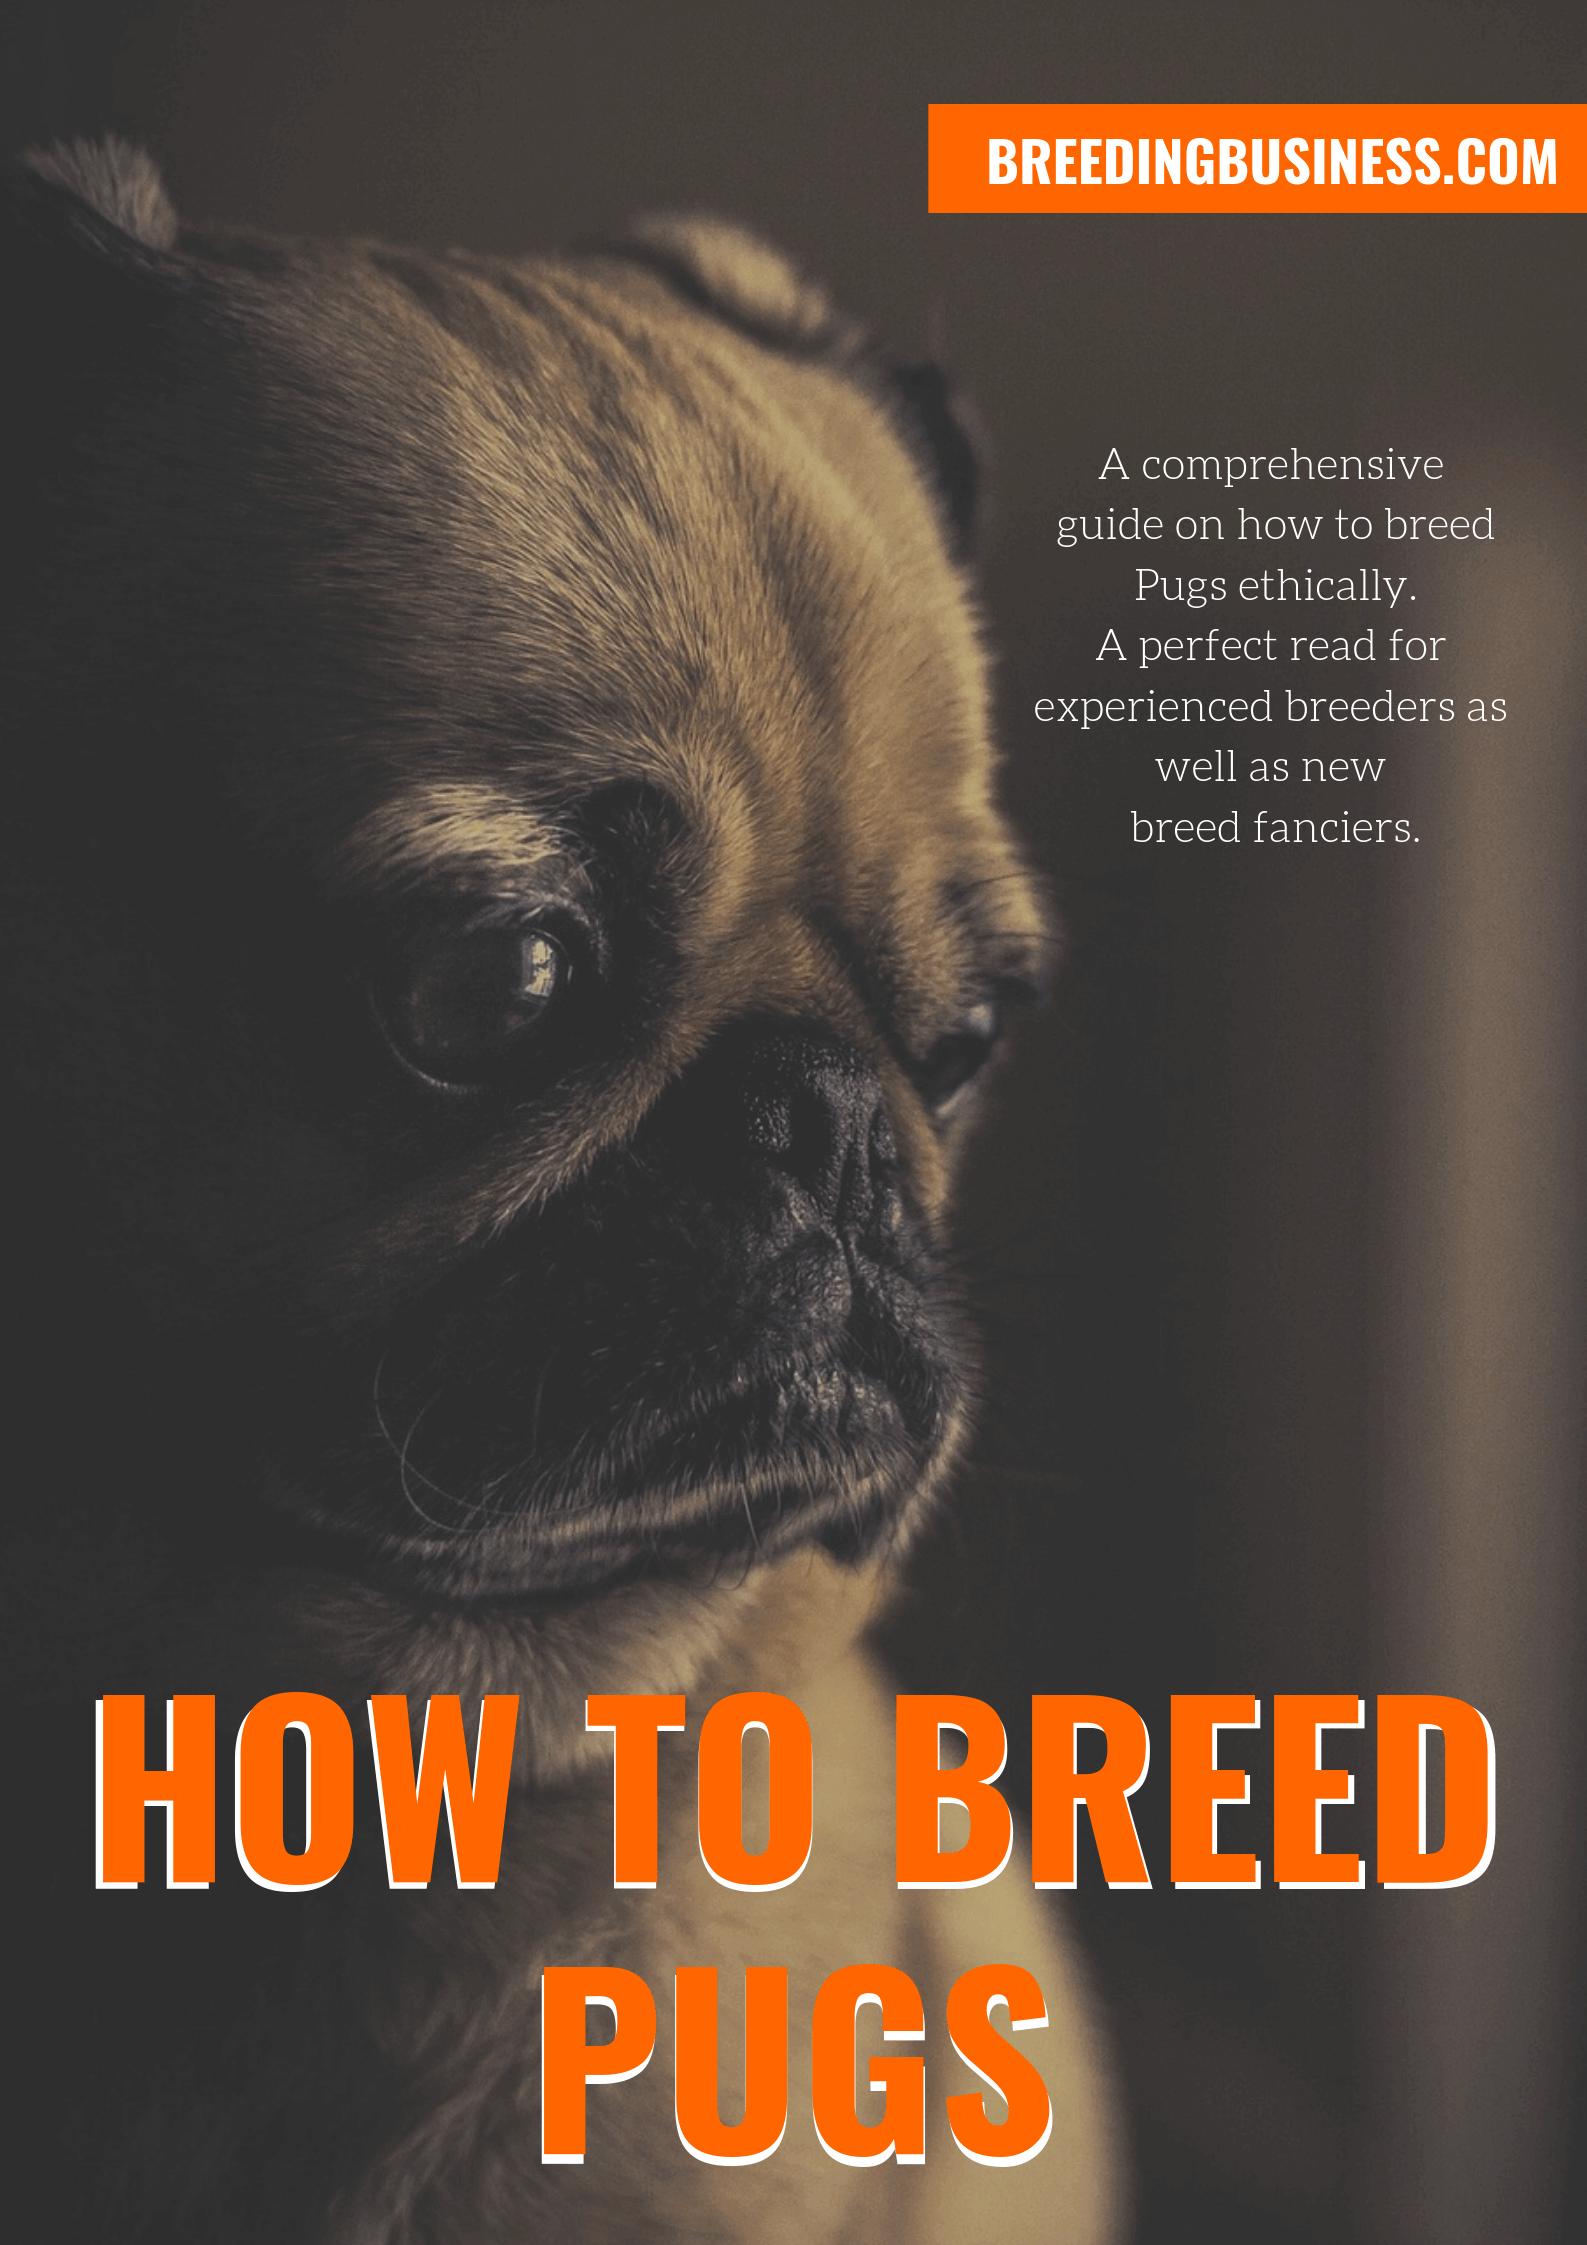 breeding Pugs